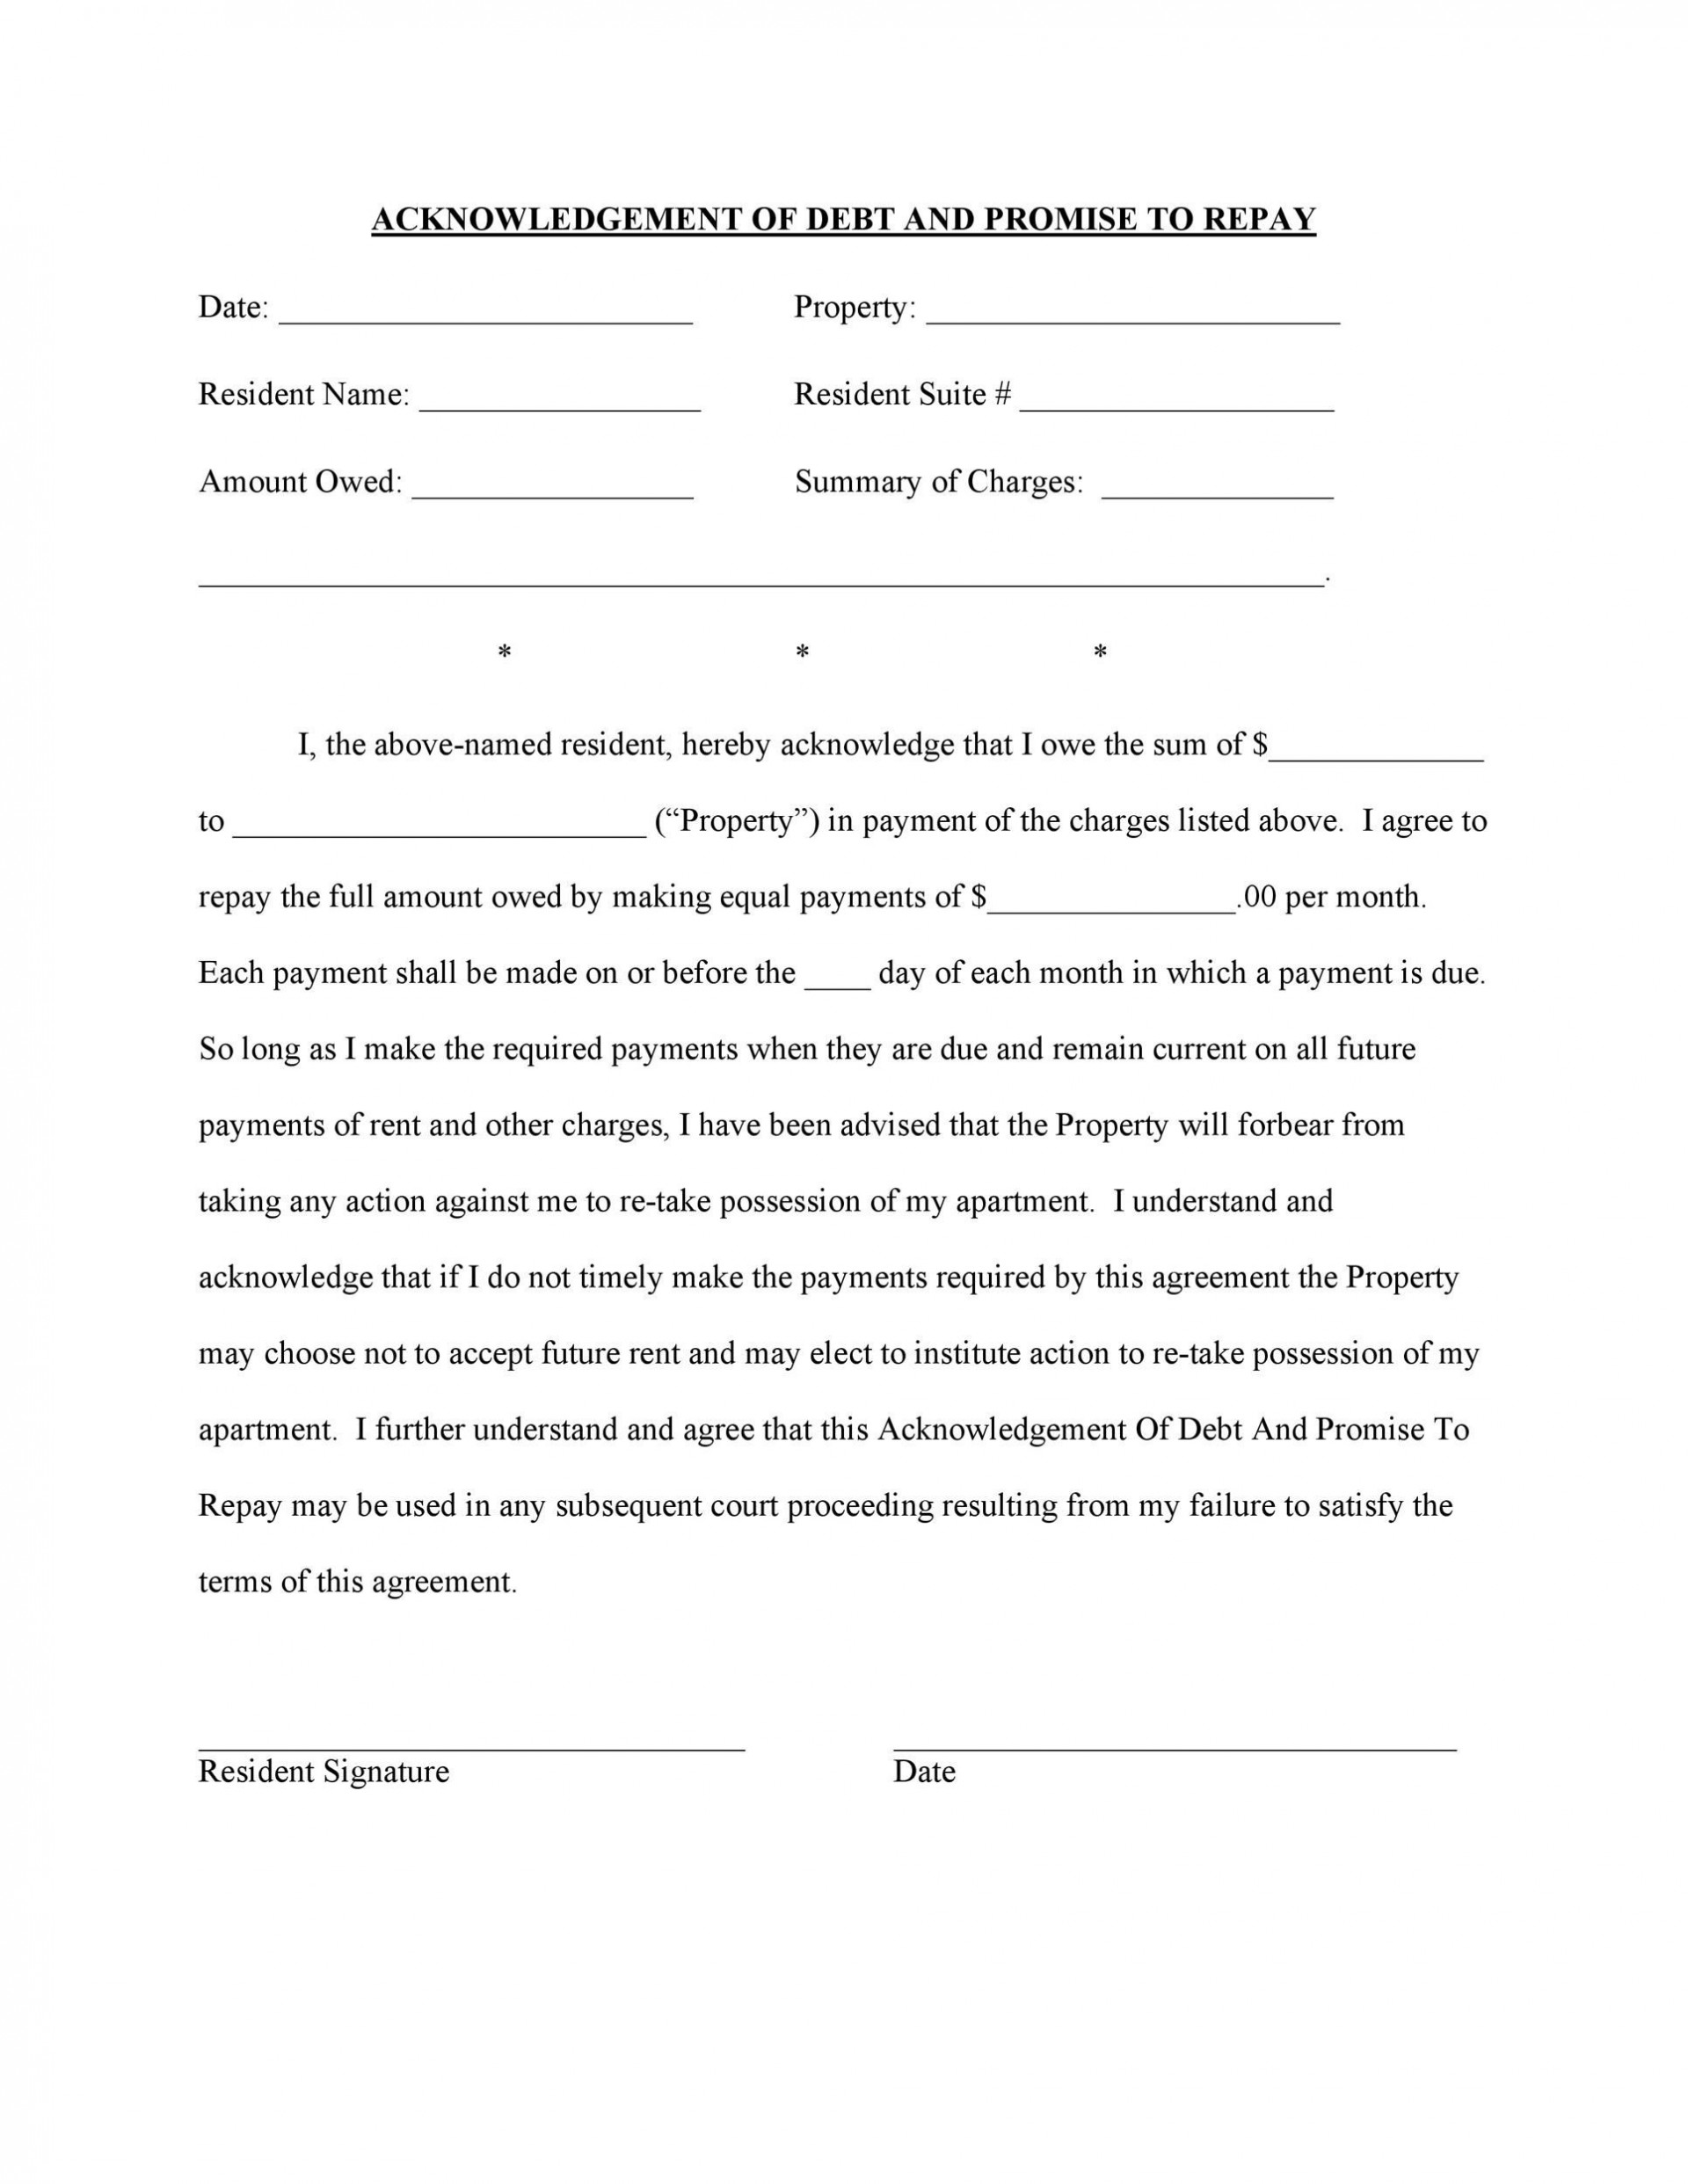 008 Unforgettable Free Family Loan Agreement Template Nz Idea 1920